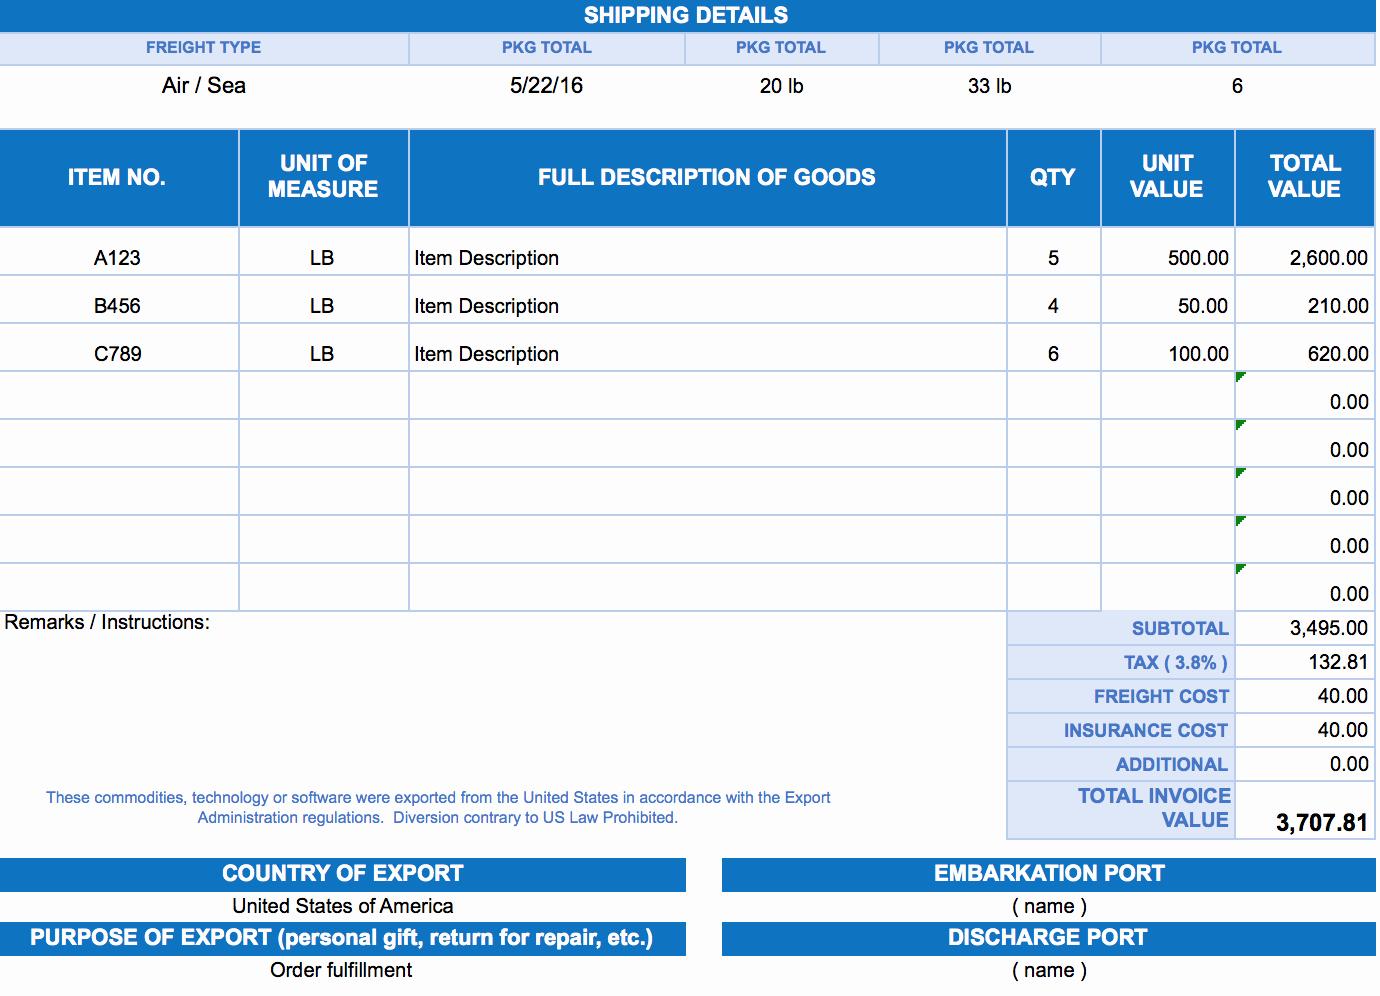 Pro forma Invoice Template Elegant Free Excel Invoice Templates Smartsheet